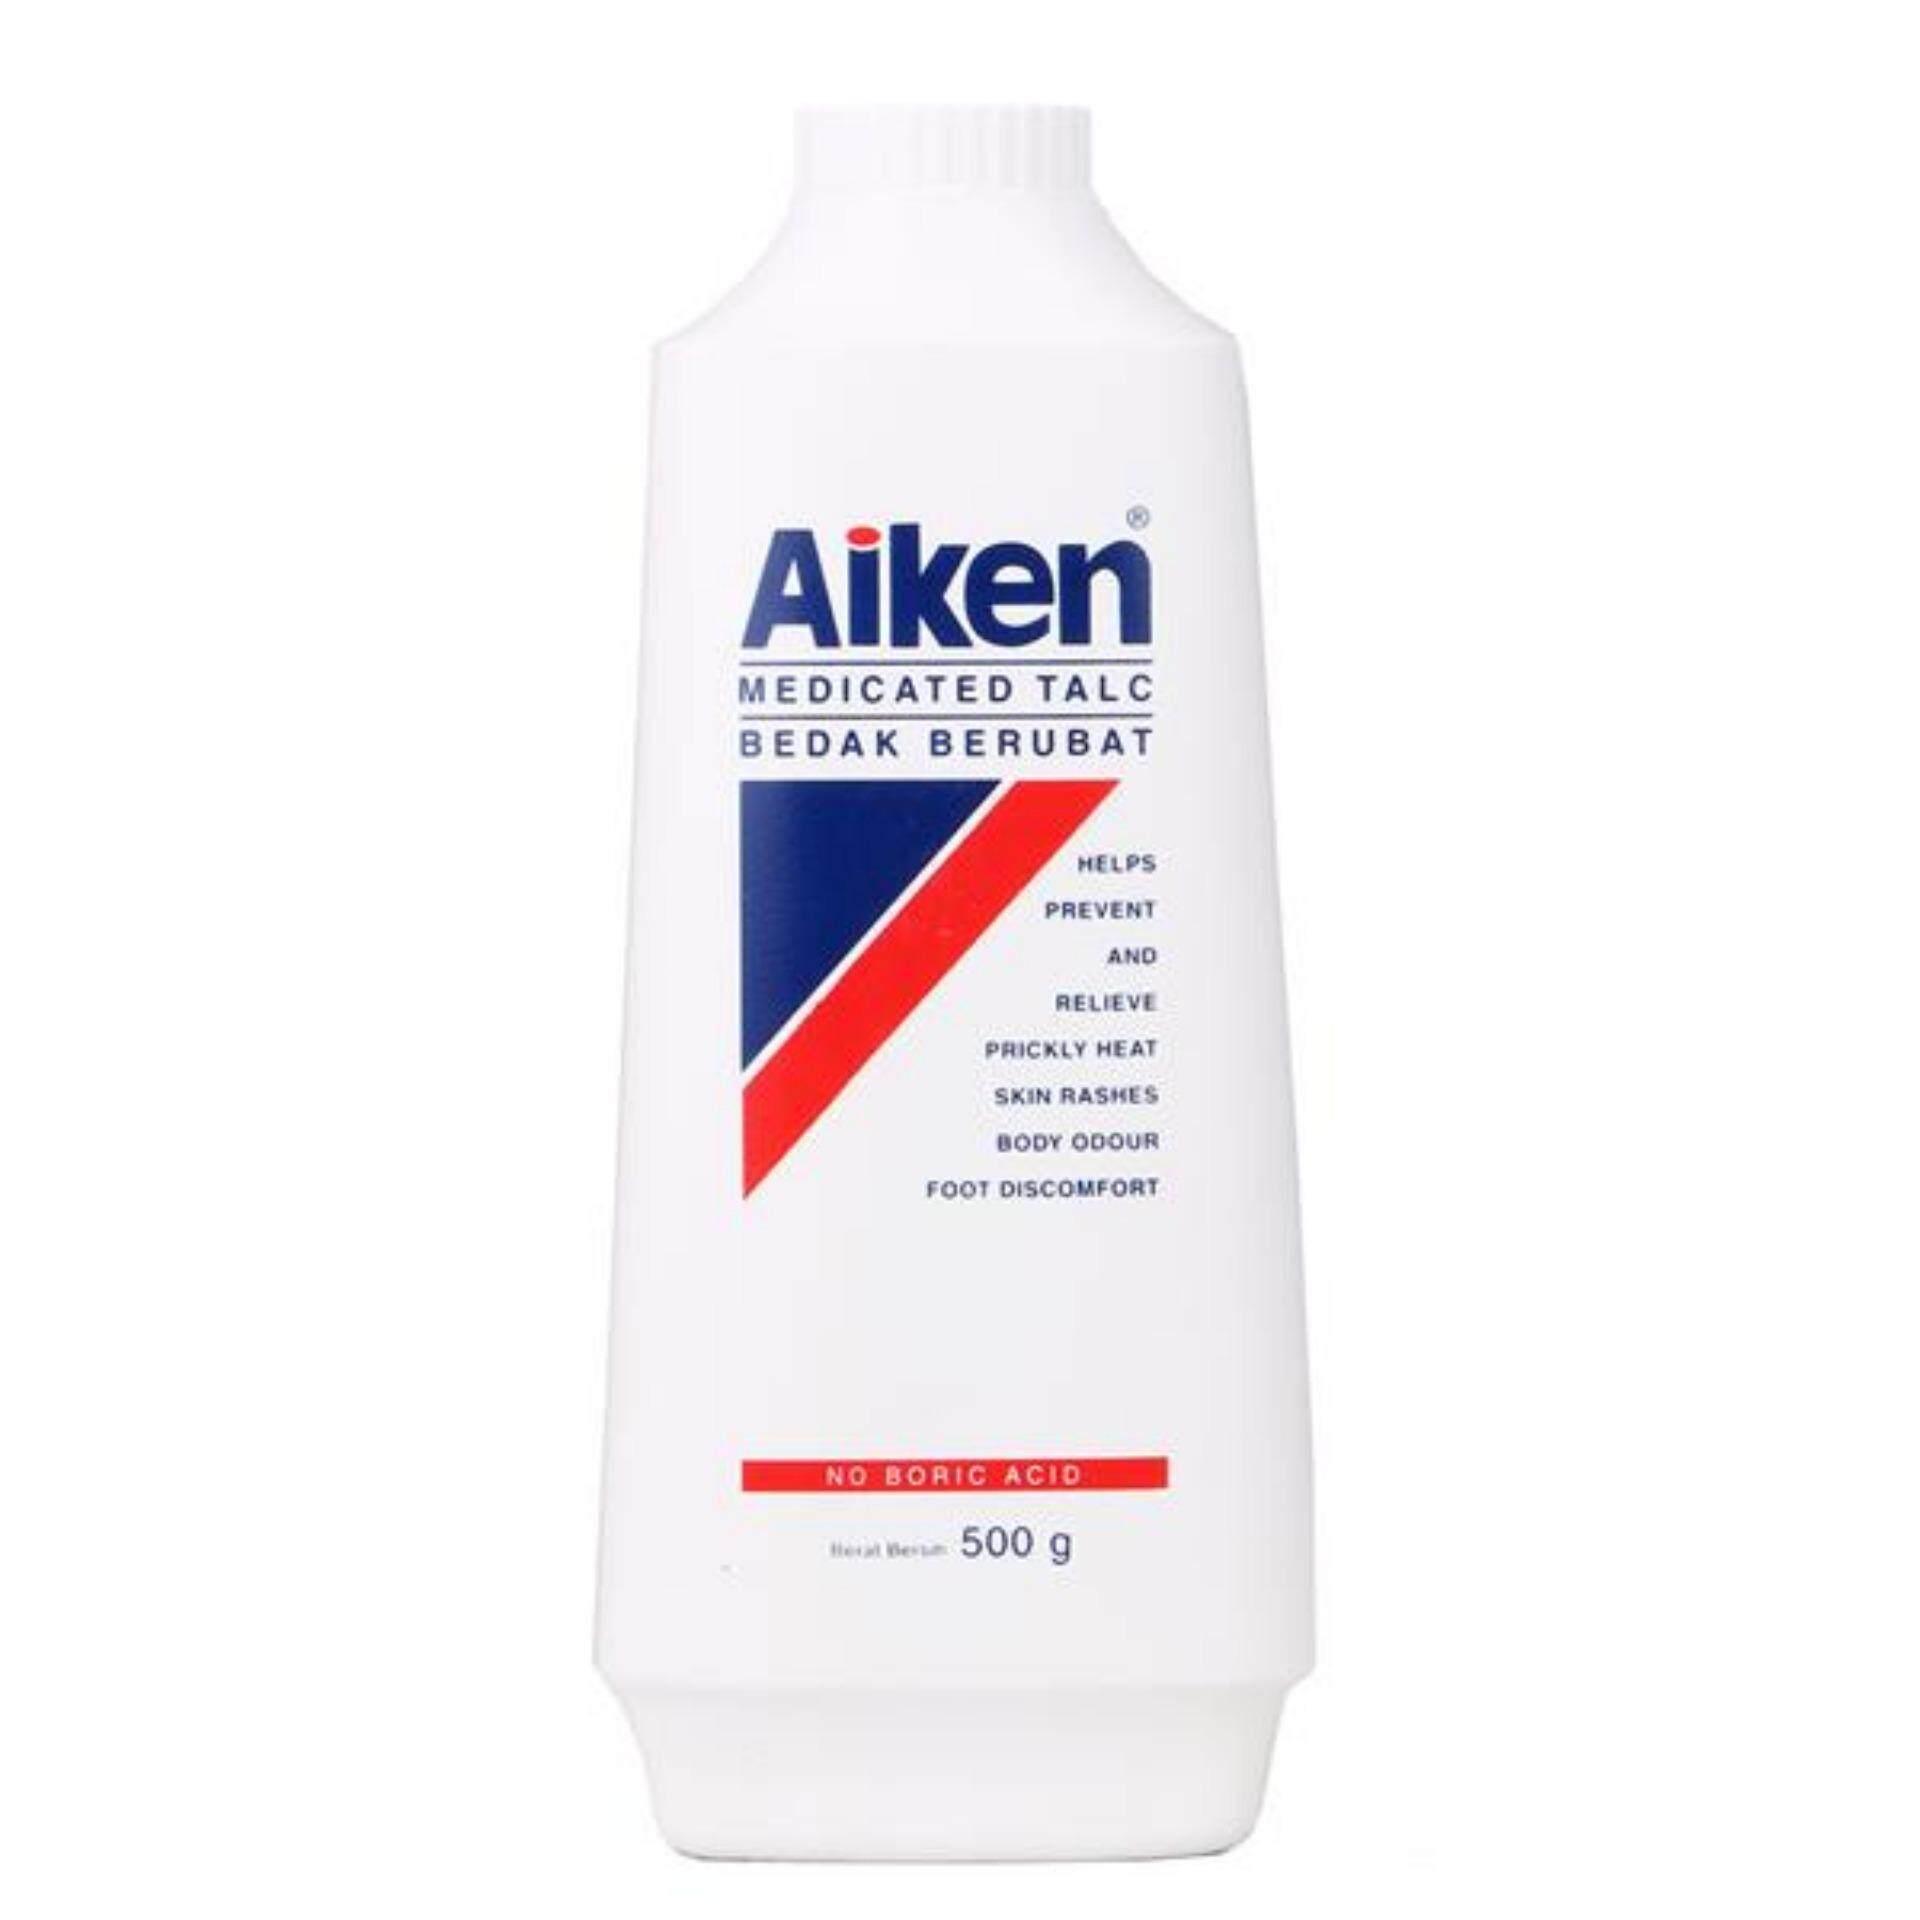 Aiken Medicated Talc 300g, for Heat Rash & Prickly Heat